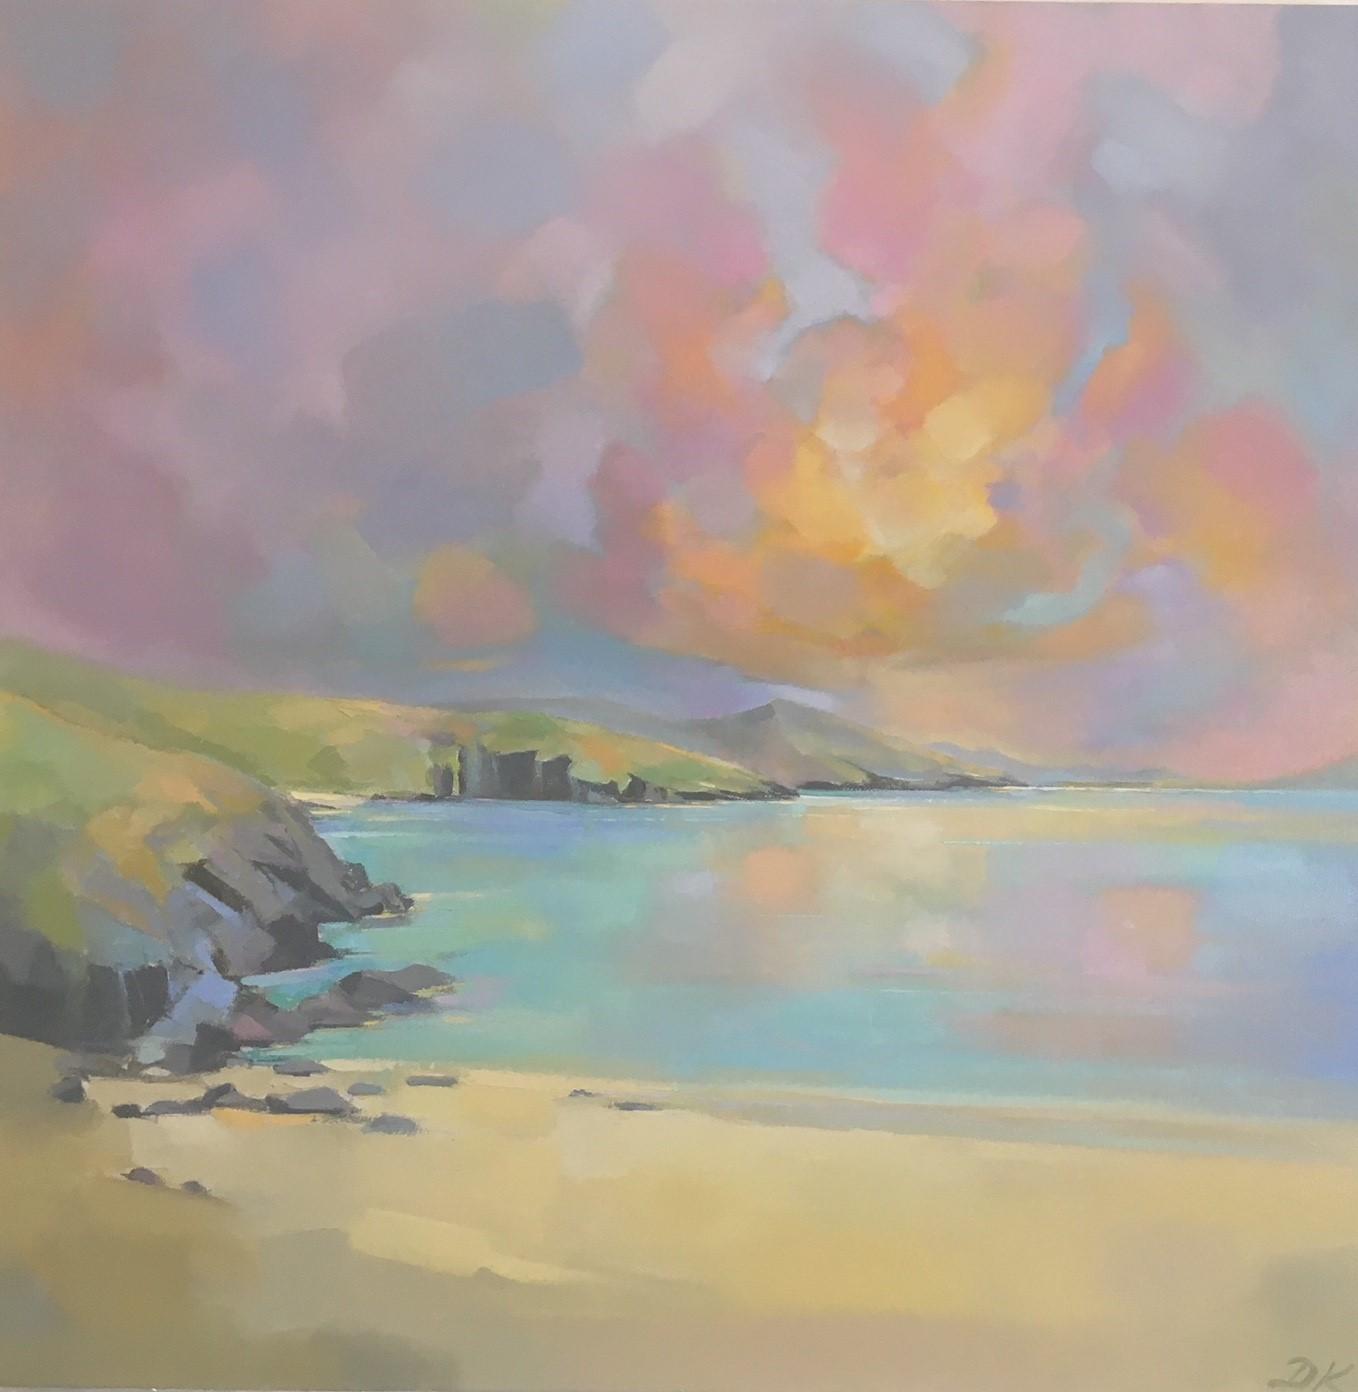 Hushinish Evening Light  Oil and acrylic on canvas  70 x 70cm  £995